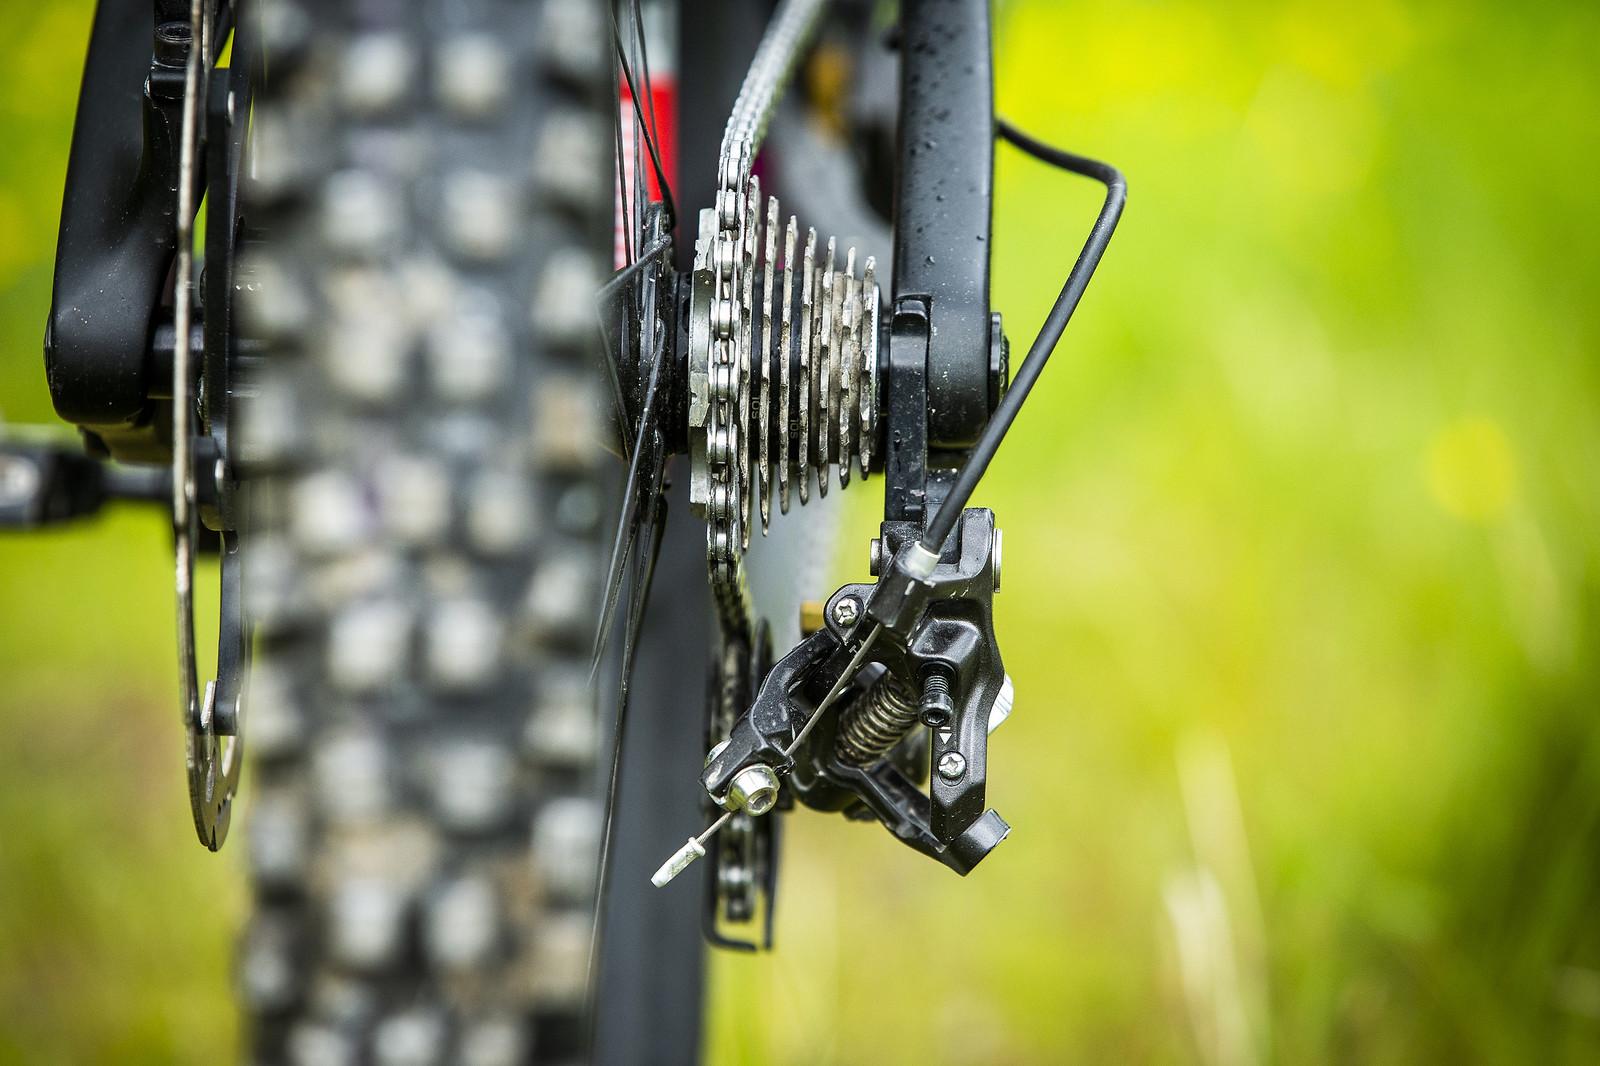 Shimano Road Cluster - WINNING BIKE - Tahnee Seagrave's Transition TR11 - Mountain Biking Pictures - Vital MTB